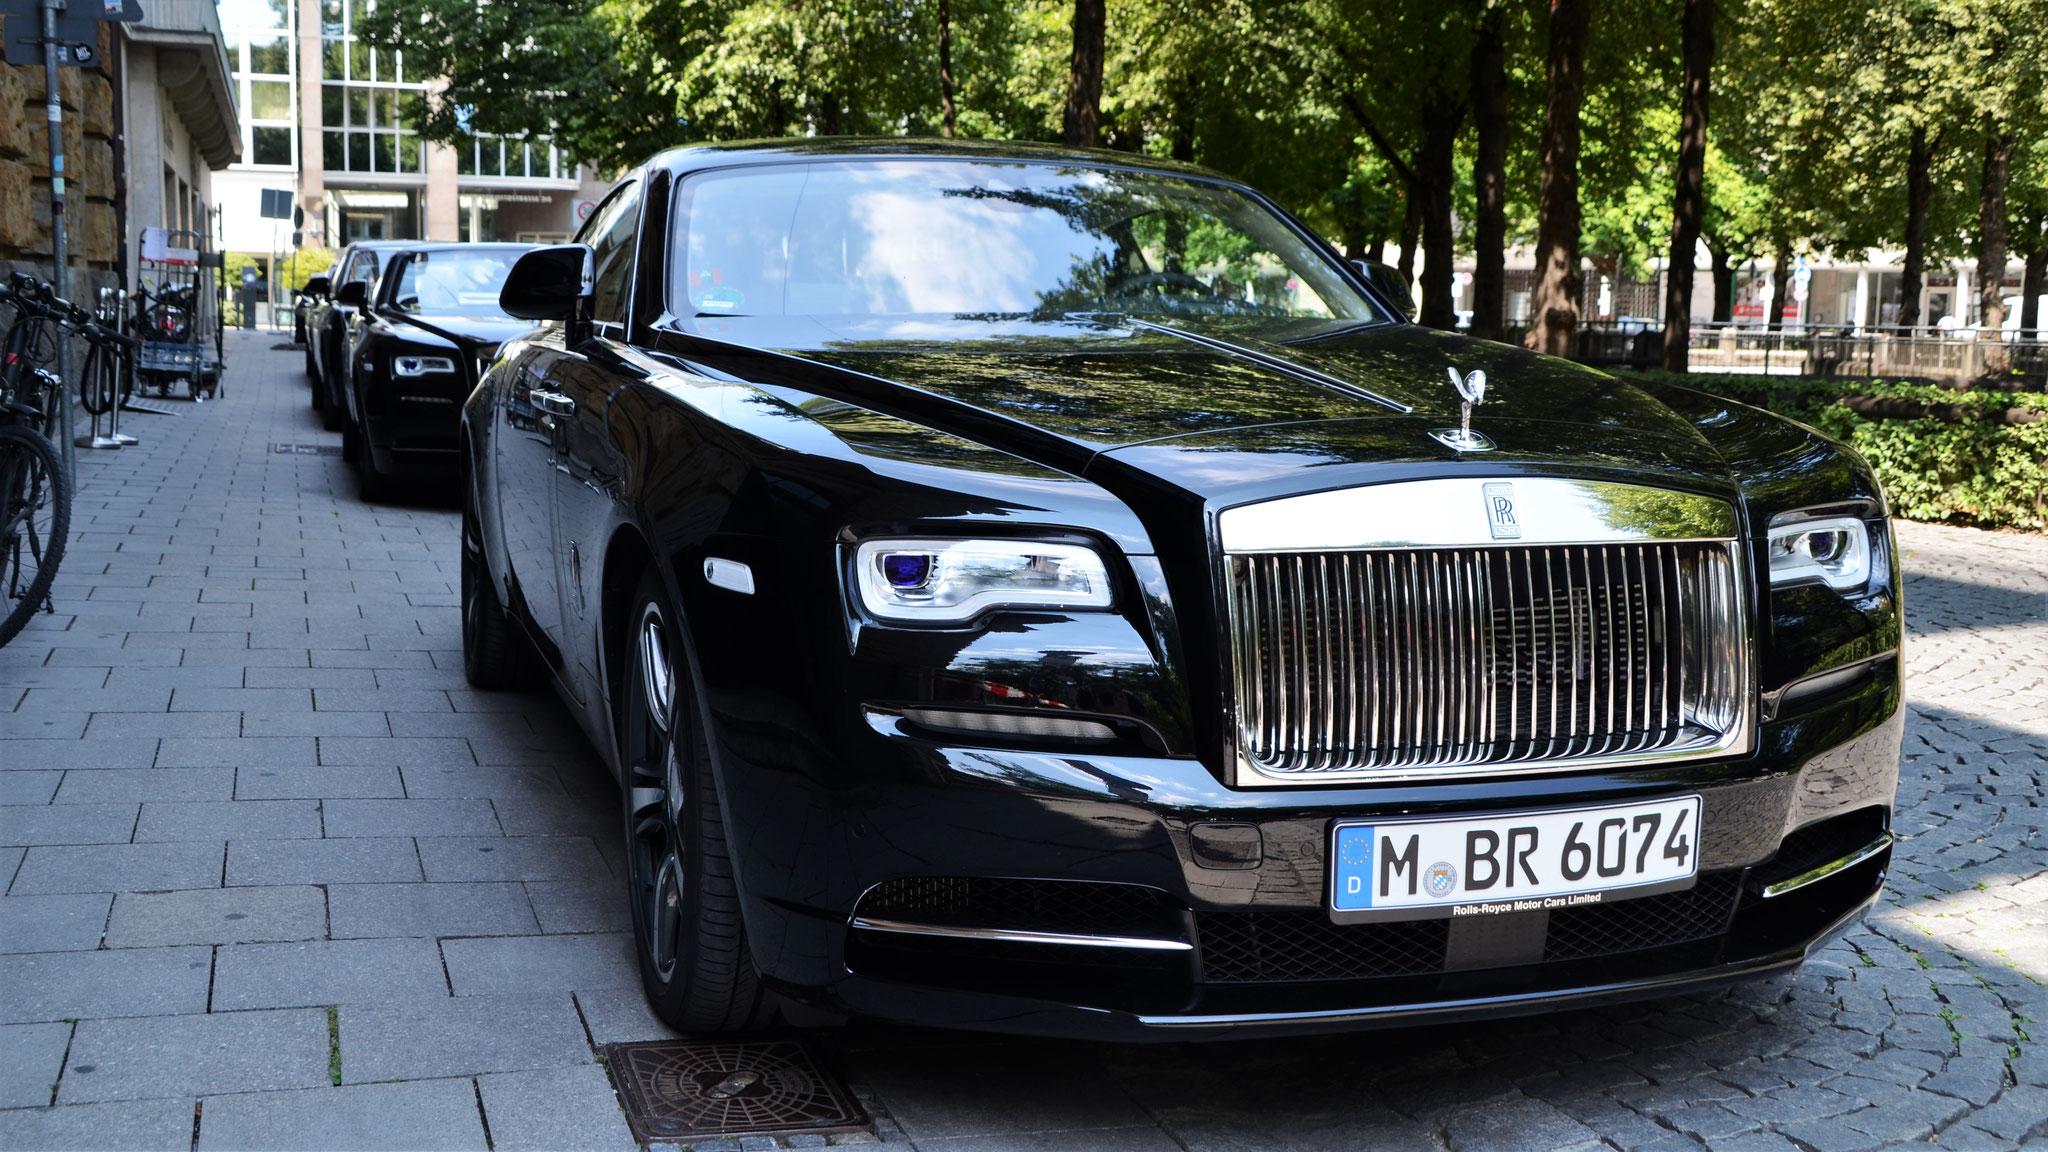 Rolls Royce Wraith - M-BR-6074